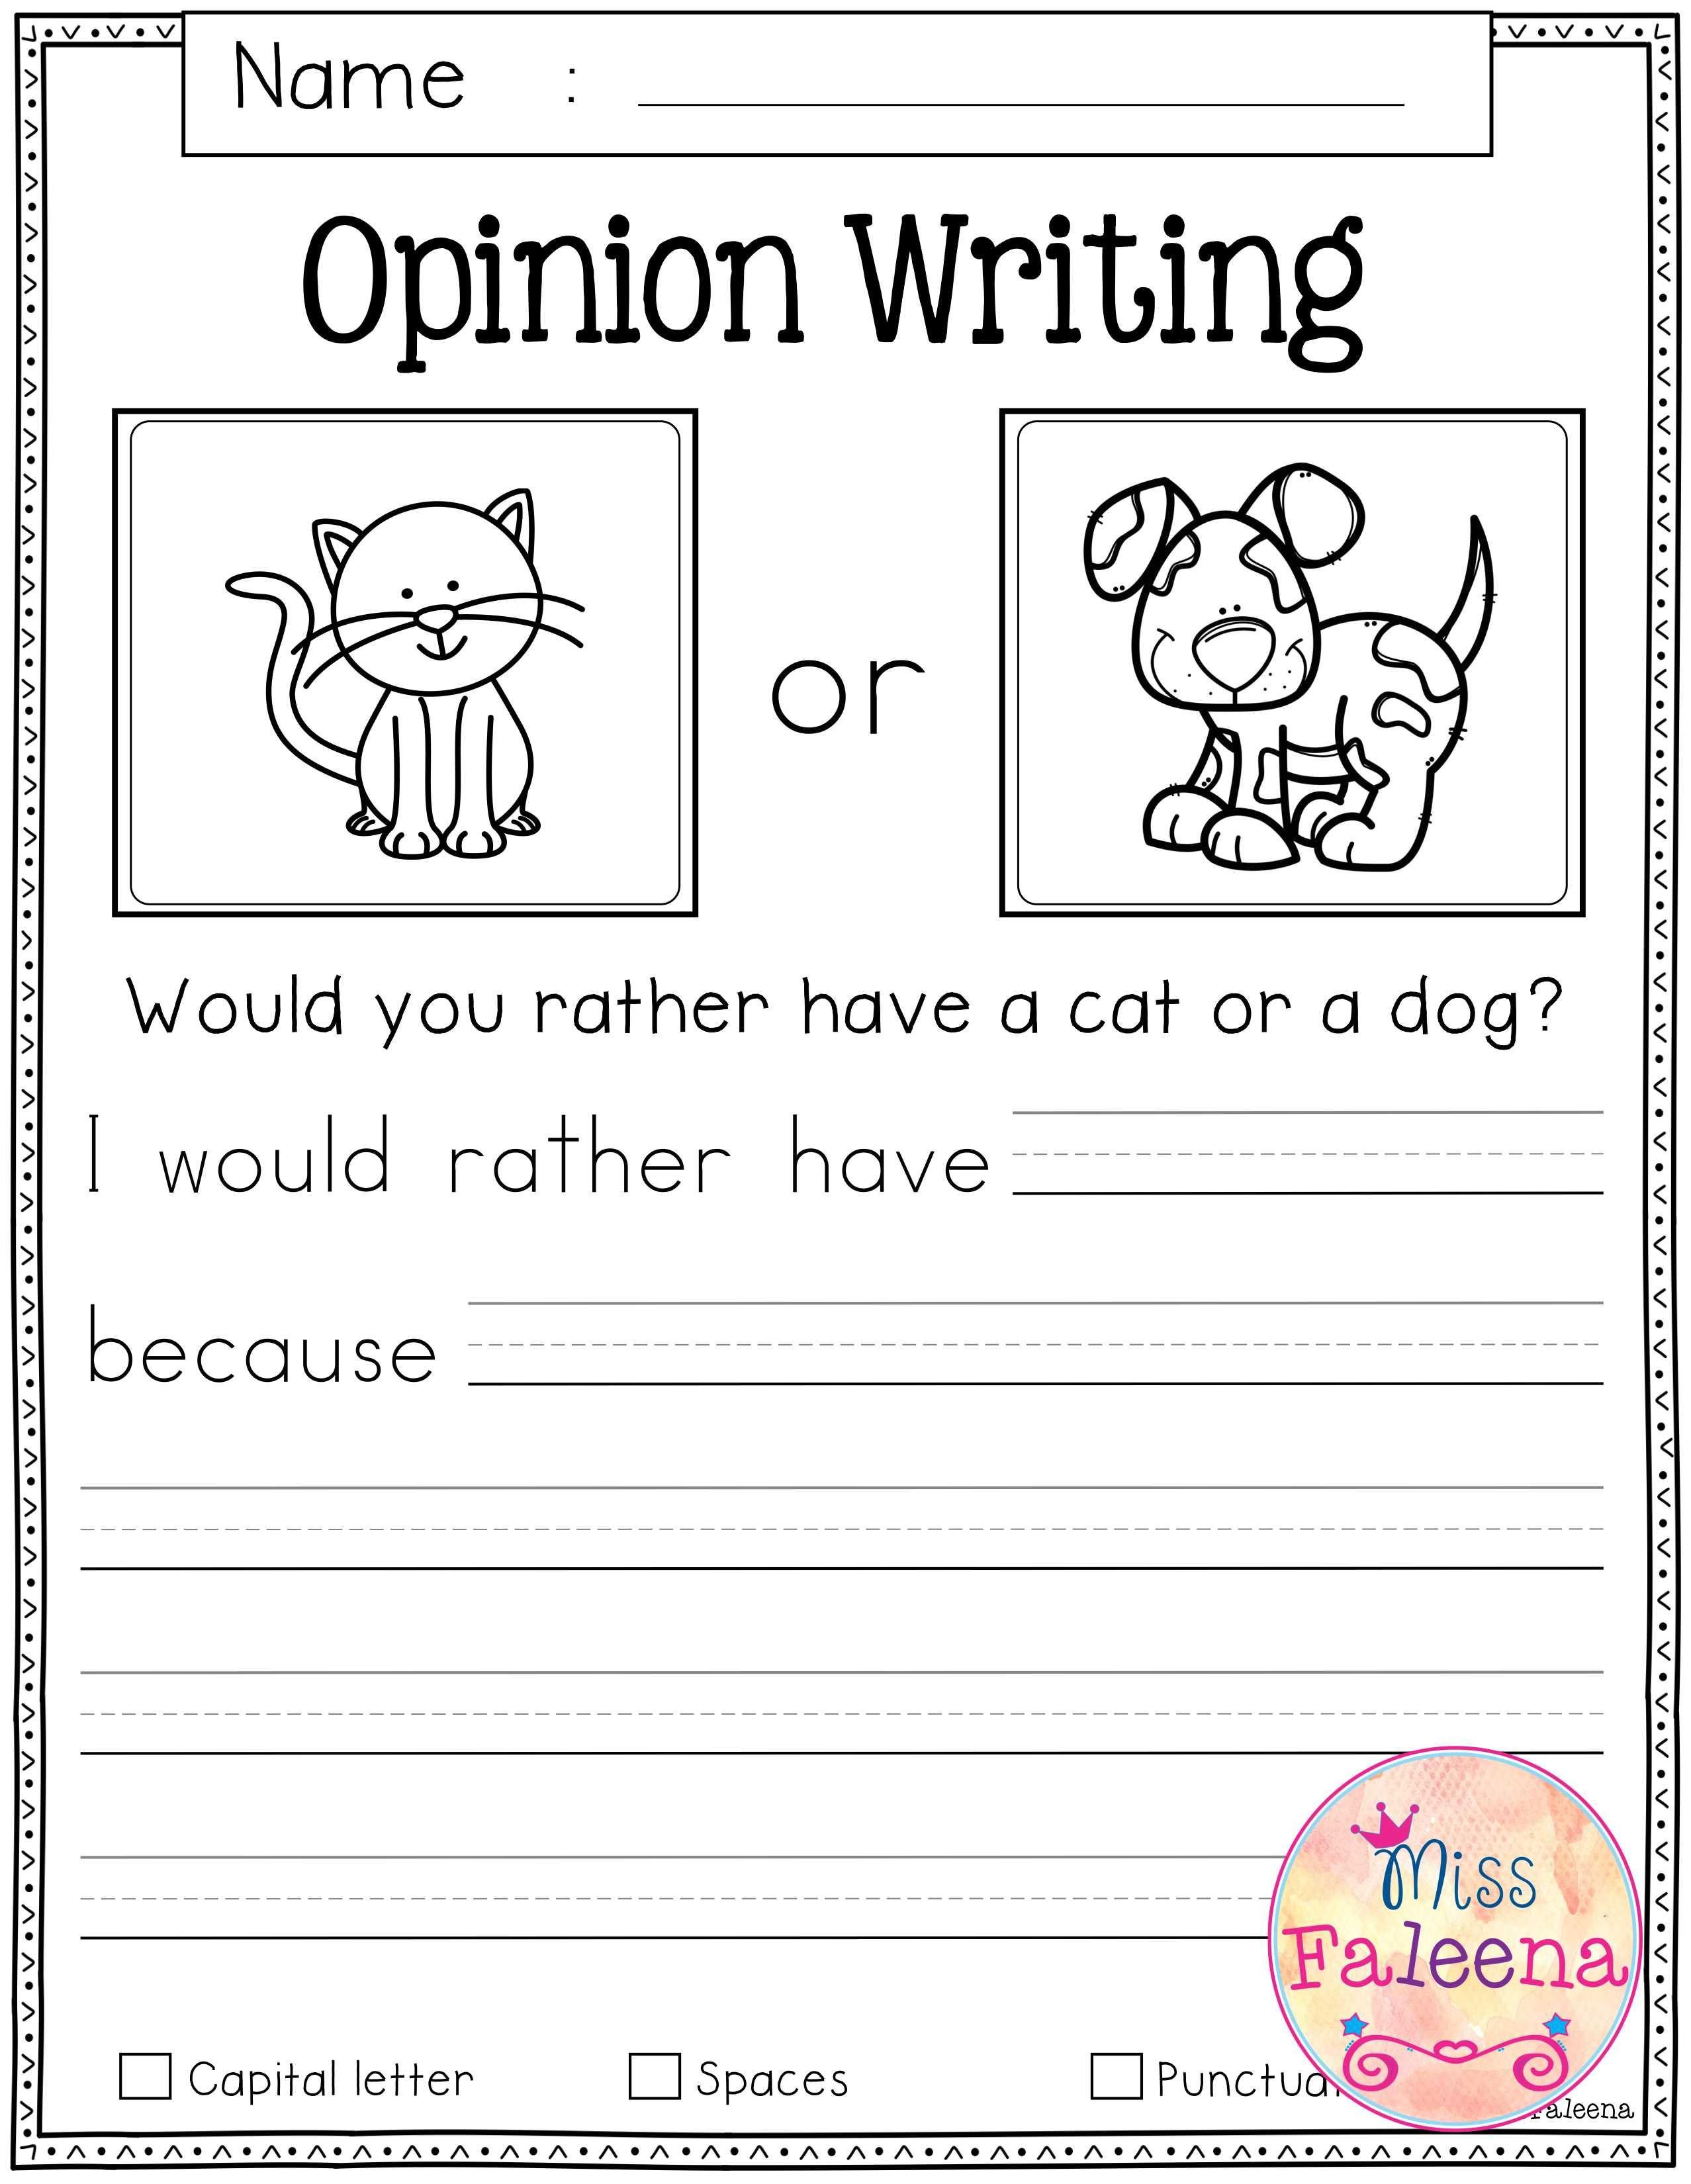 Free Writing Prompts Free Writing Prompts Kindergarten Writing Prompts Writing Prompts For Kids